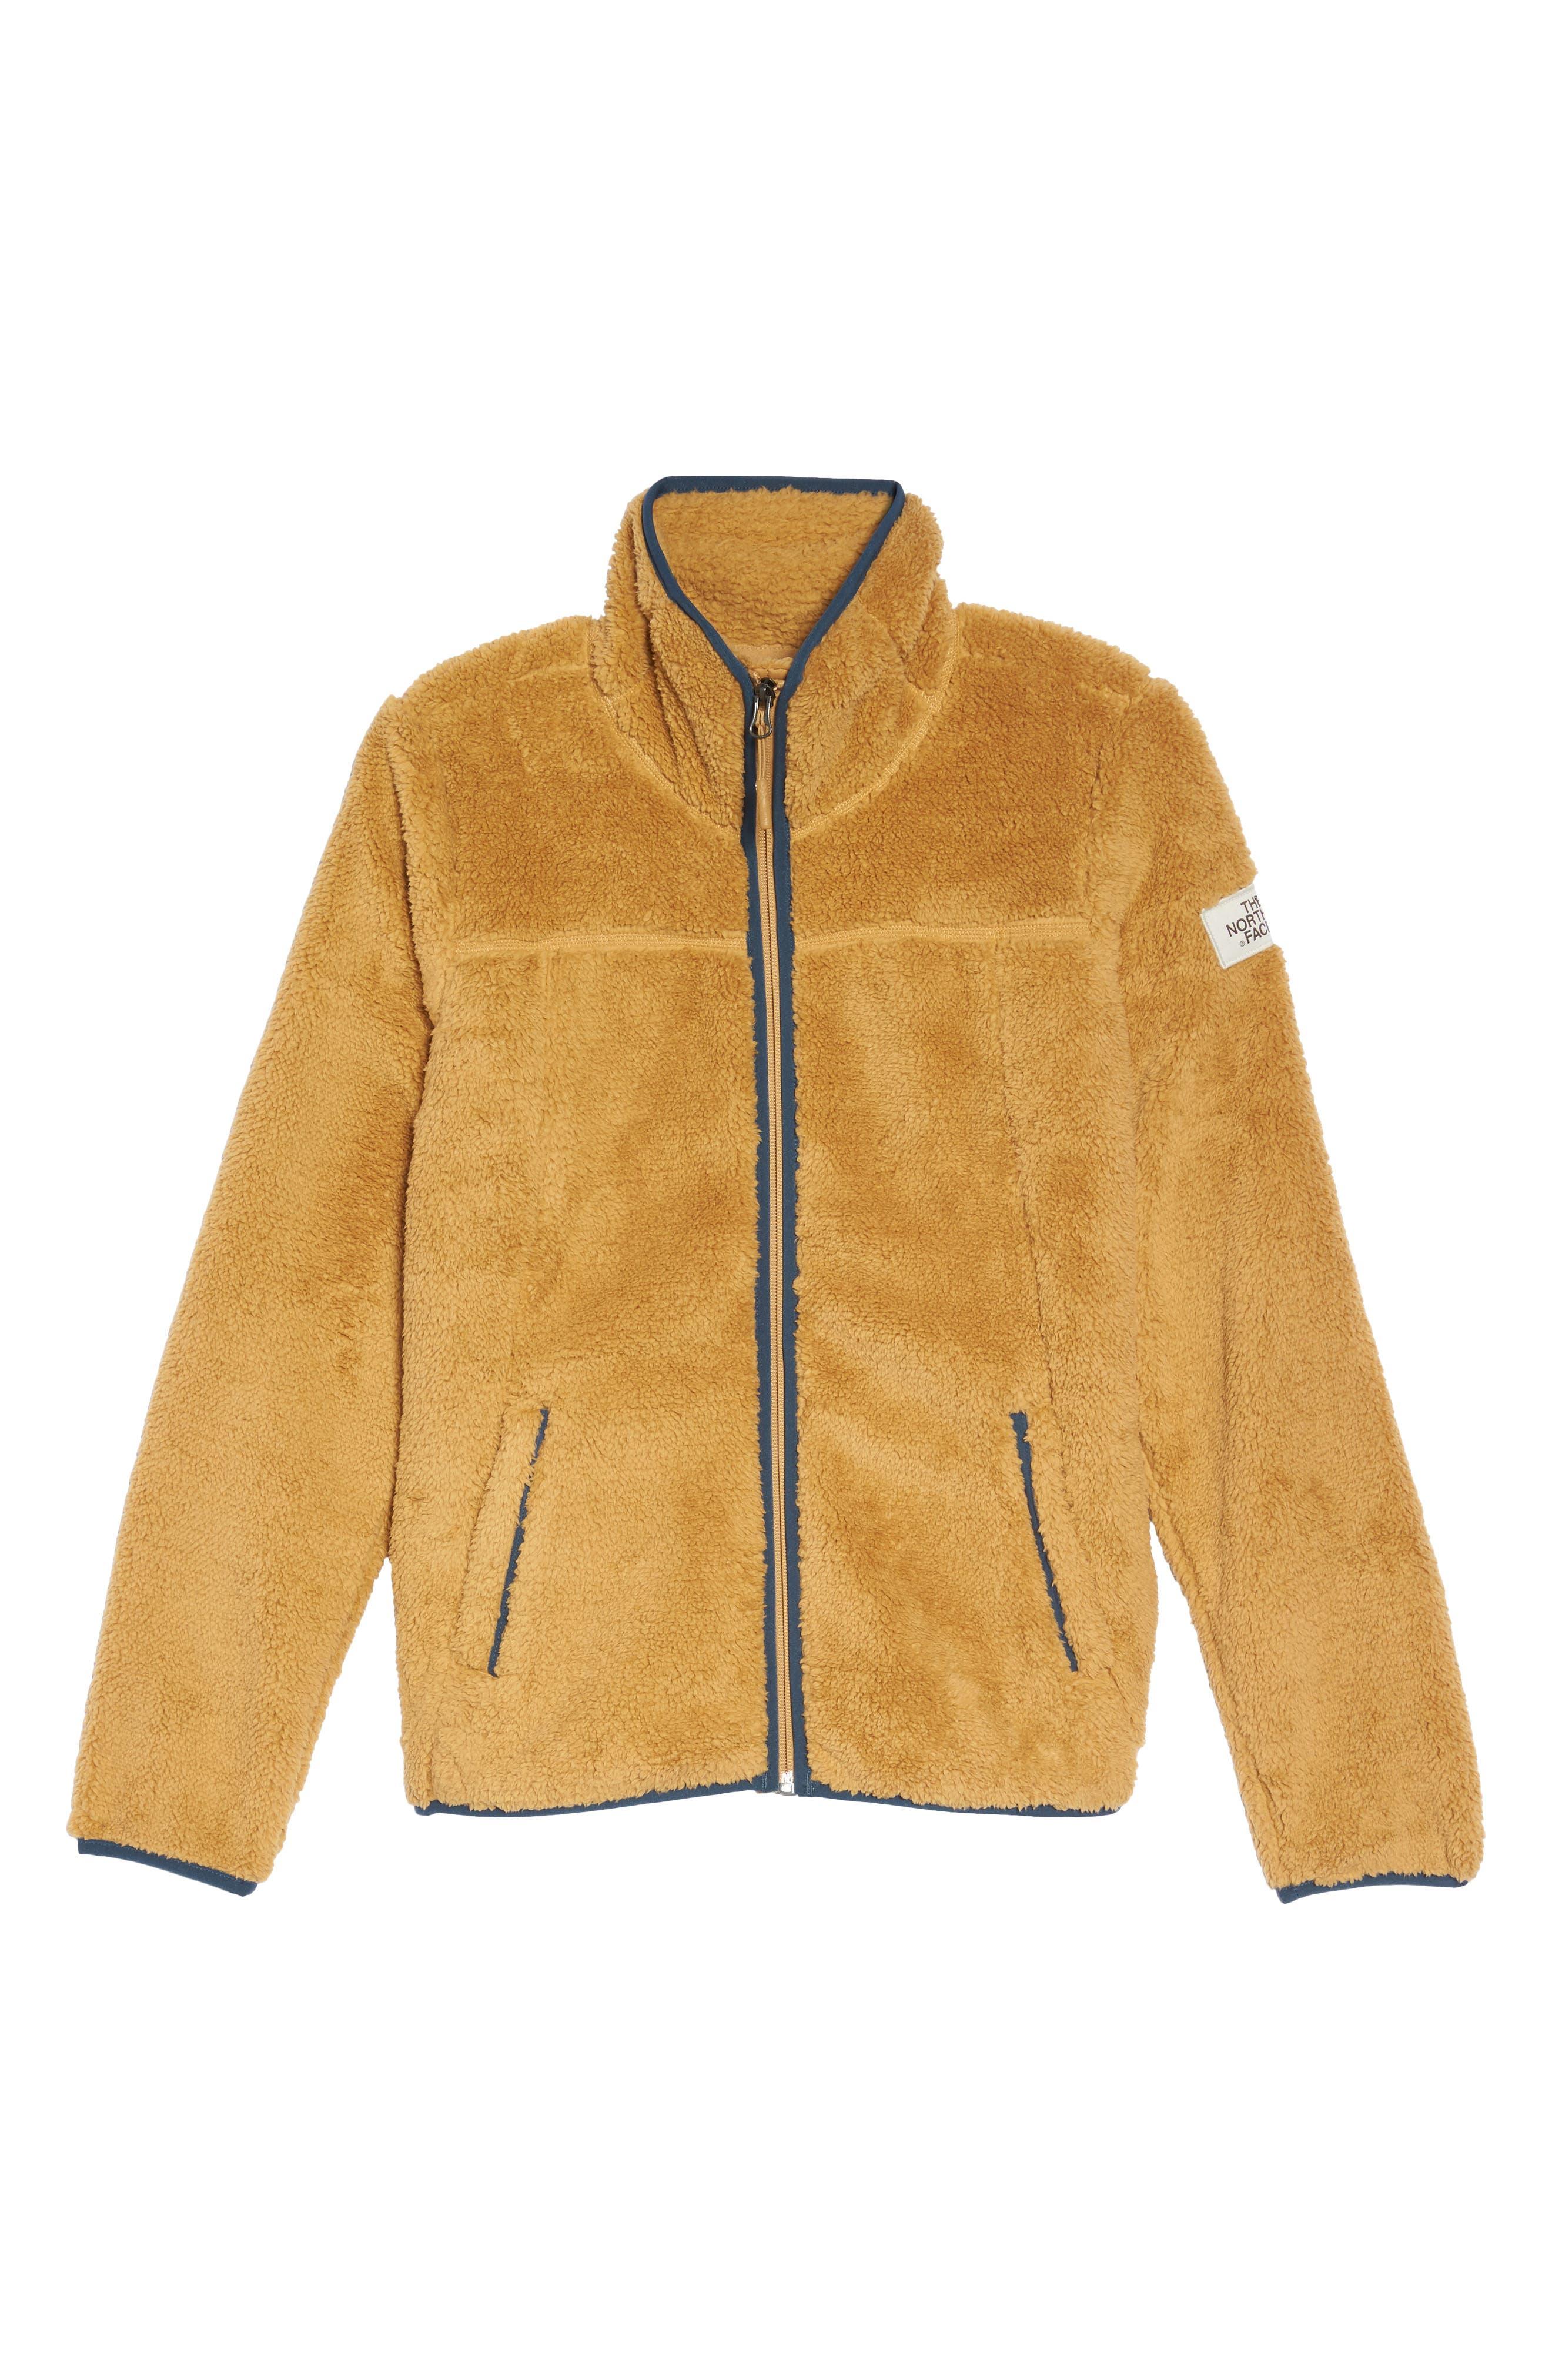 Campshire Zip Jacket,                             Alternate thumbnail 7, color,                             Biscuit Tan